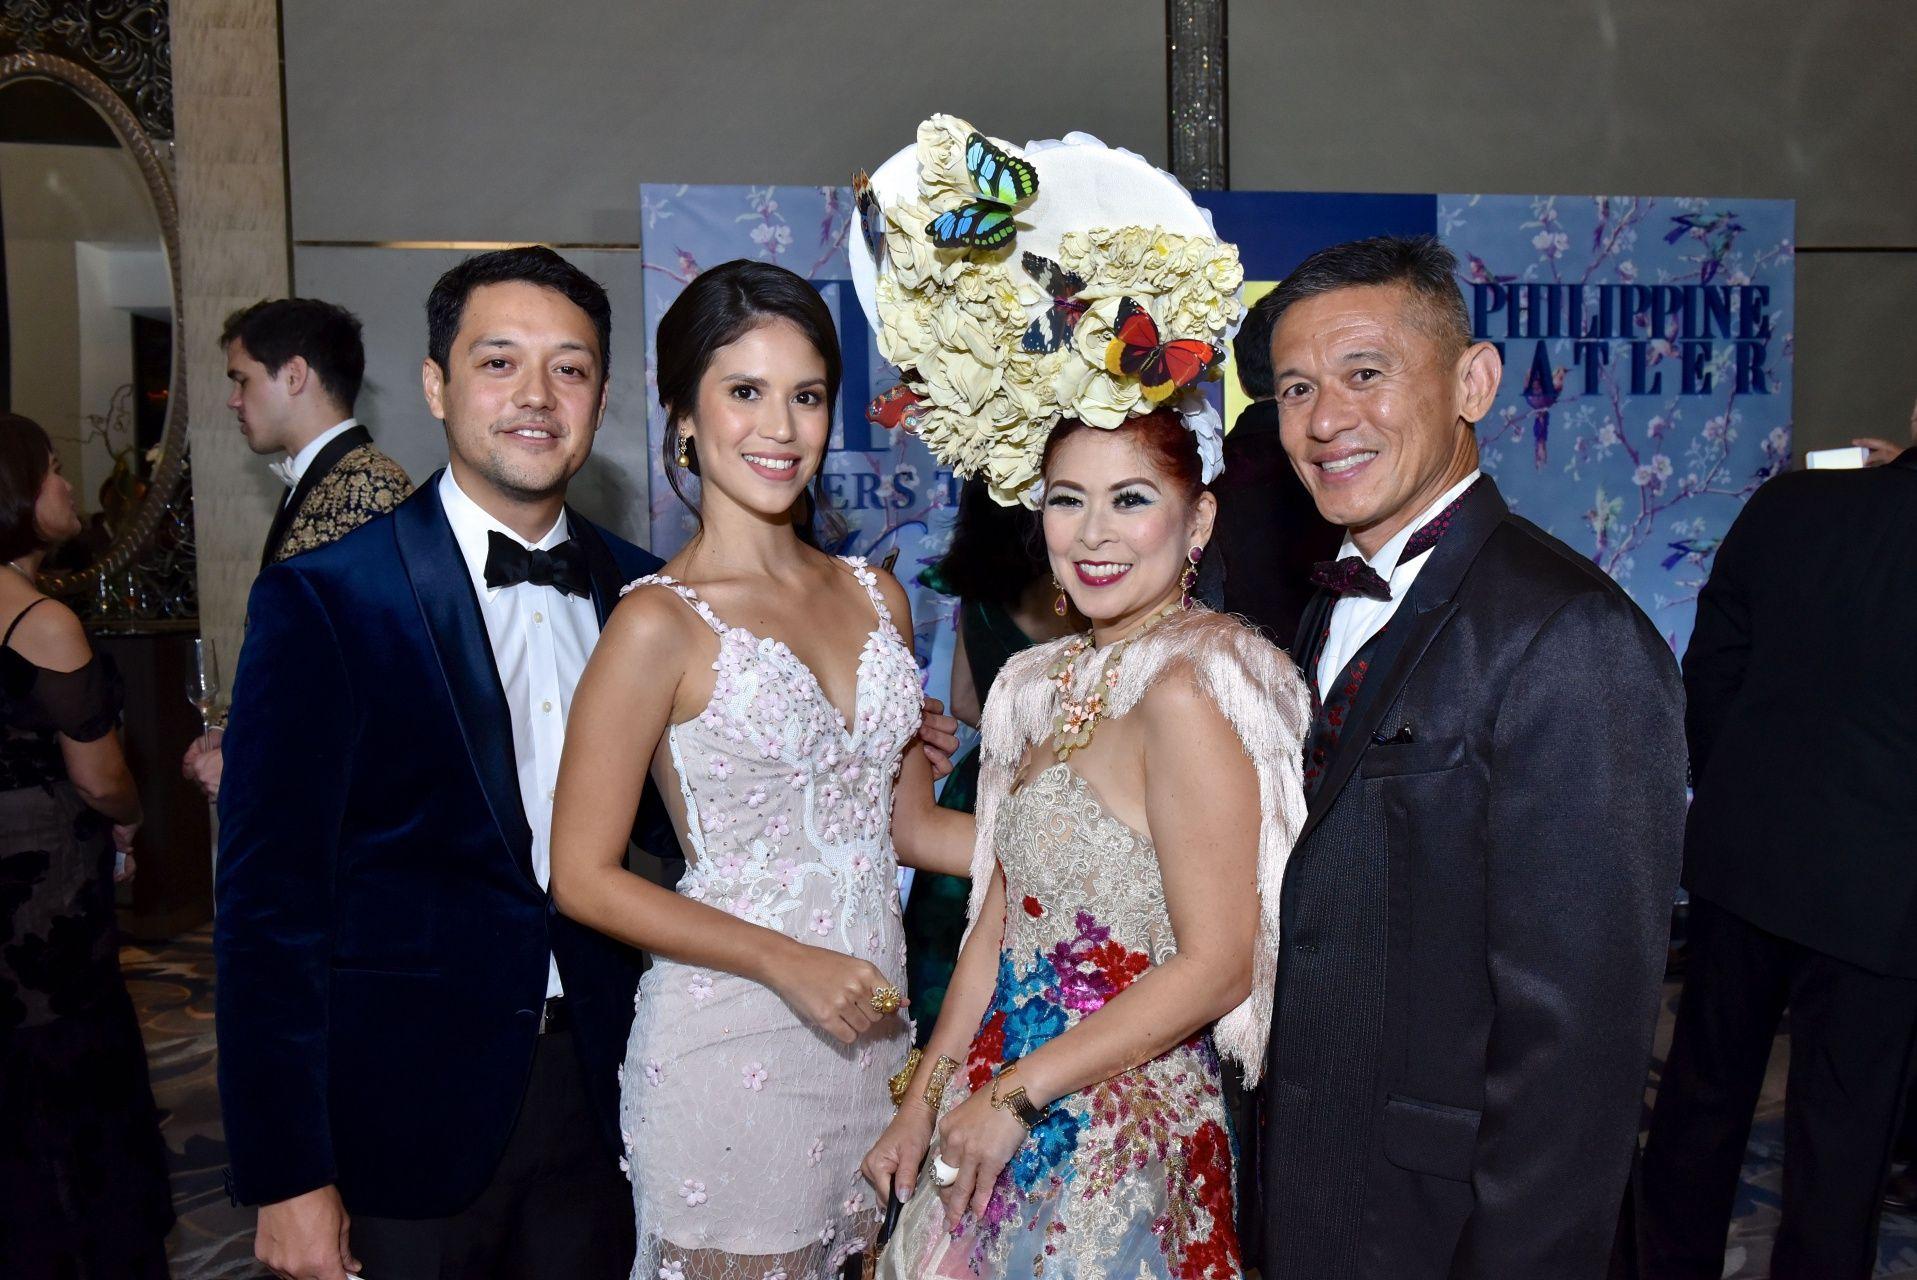 Martin De Guzman, Marion Branellec, Tessa and Dennis Valdez